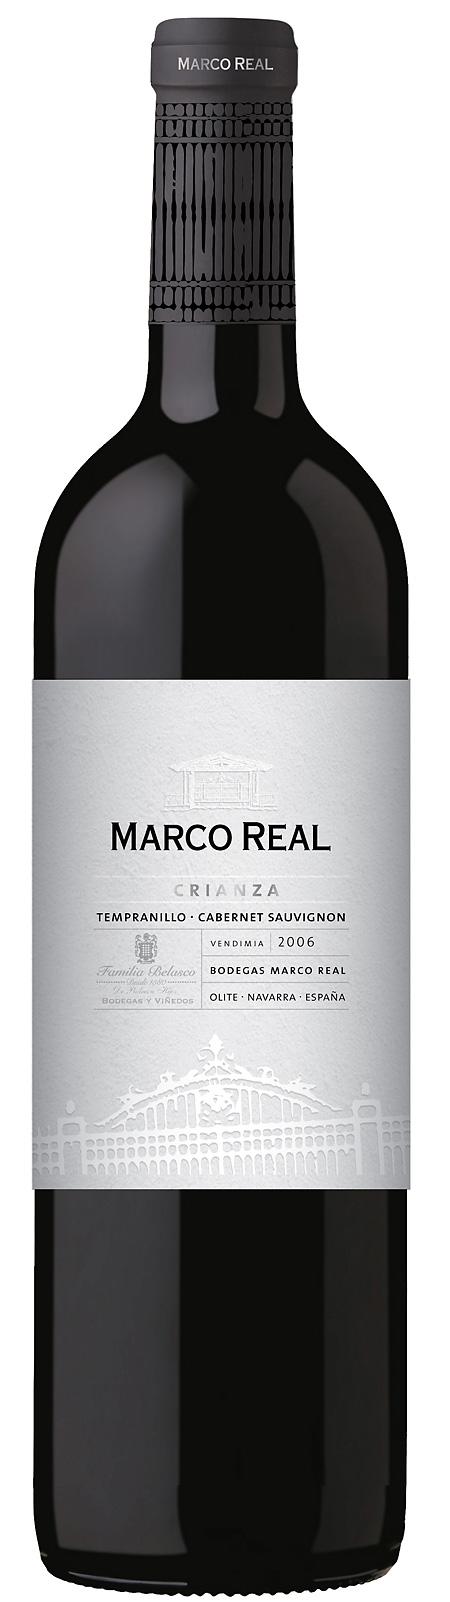 2013 Marco Real Crianza Merlot Tempranillo Syrah